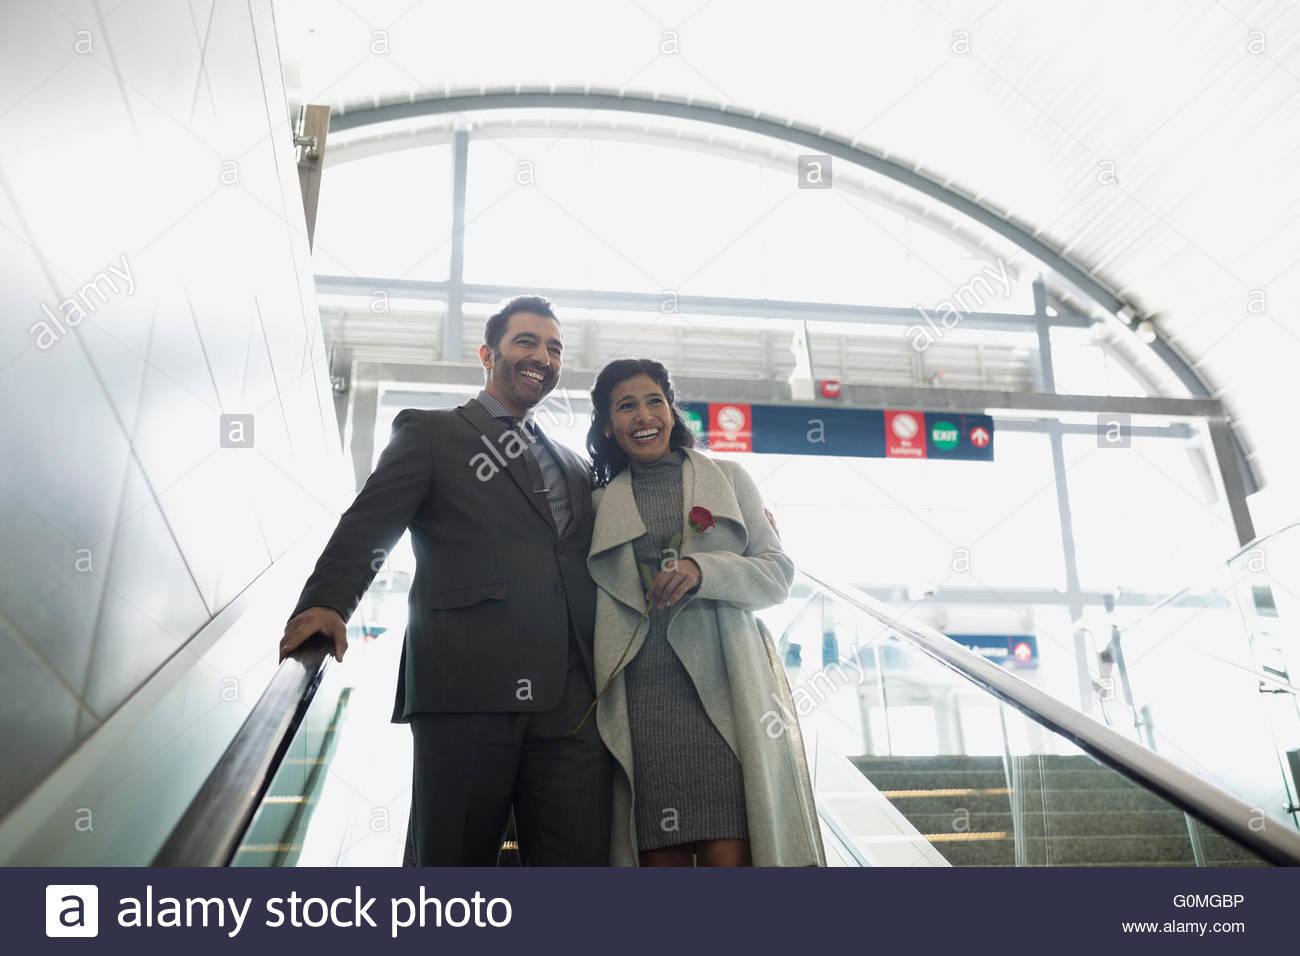 Smiling couple descending escalator at train station - Stock Image